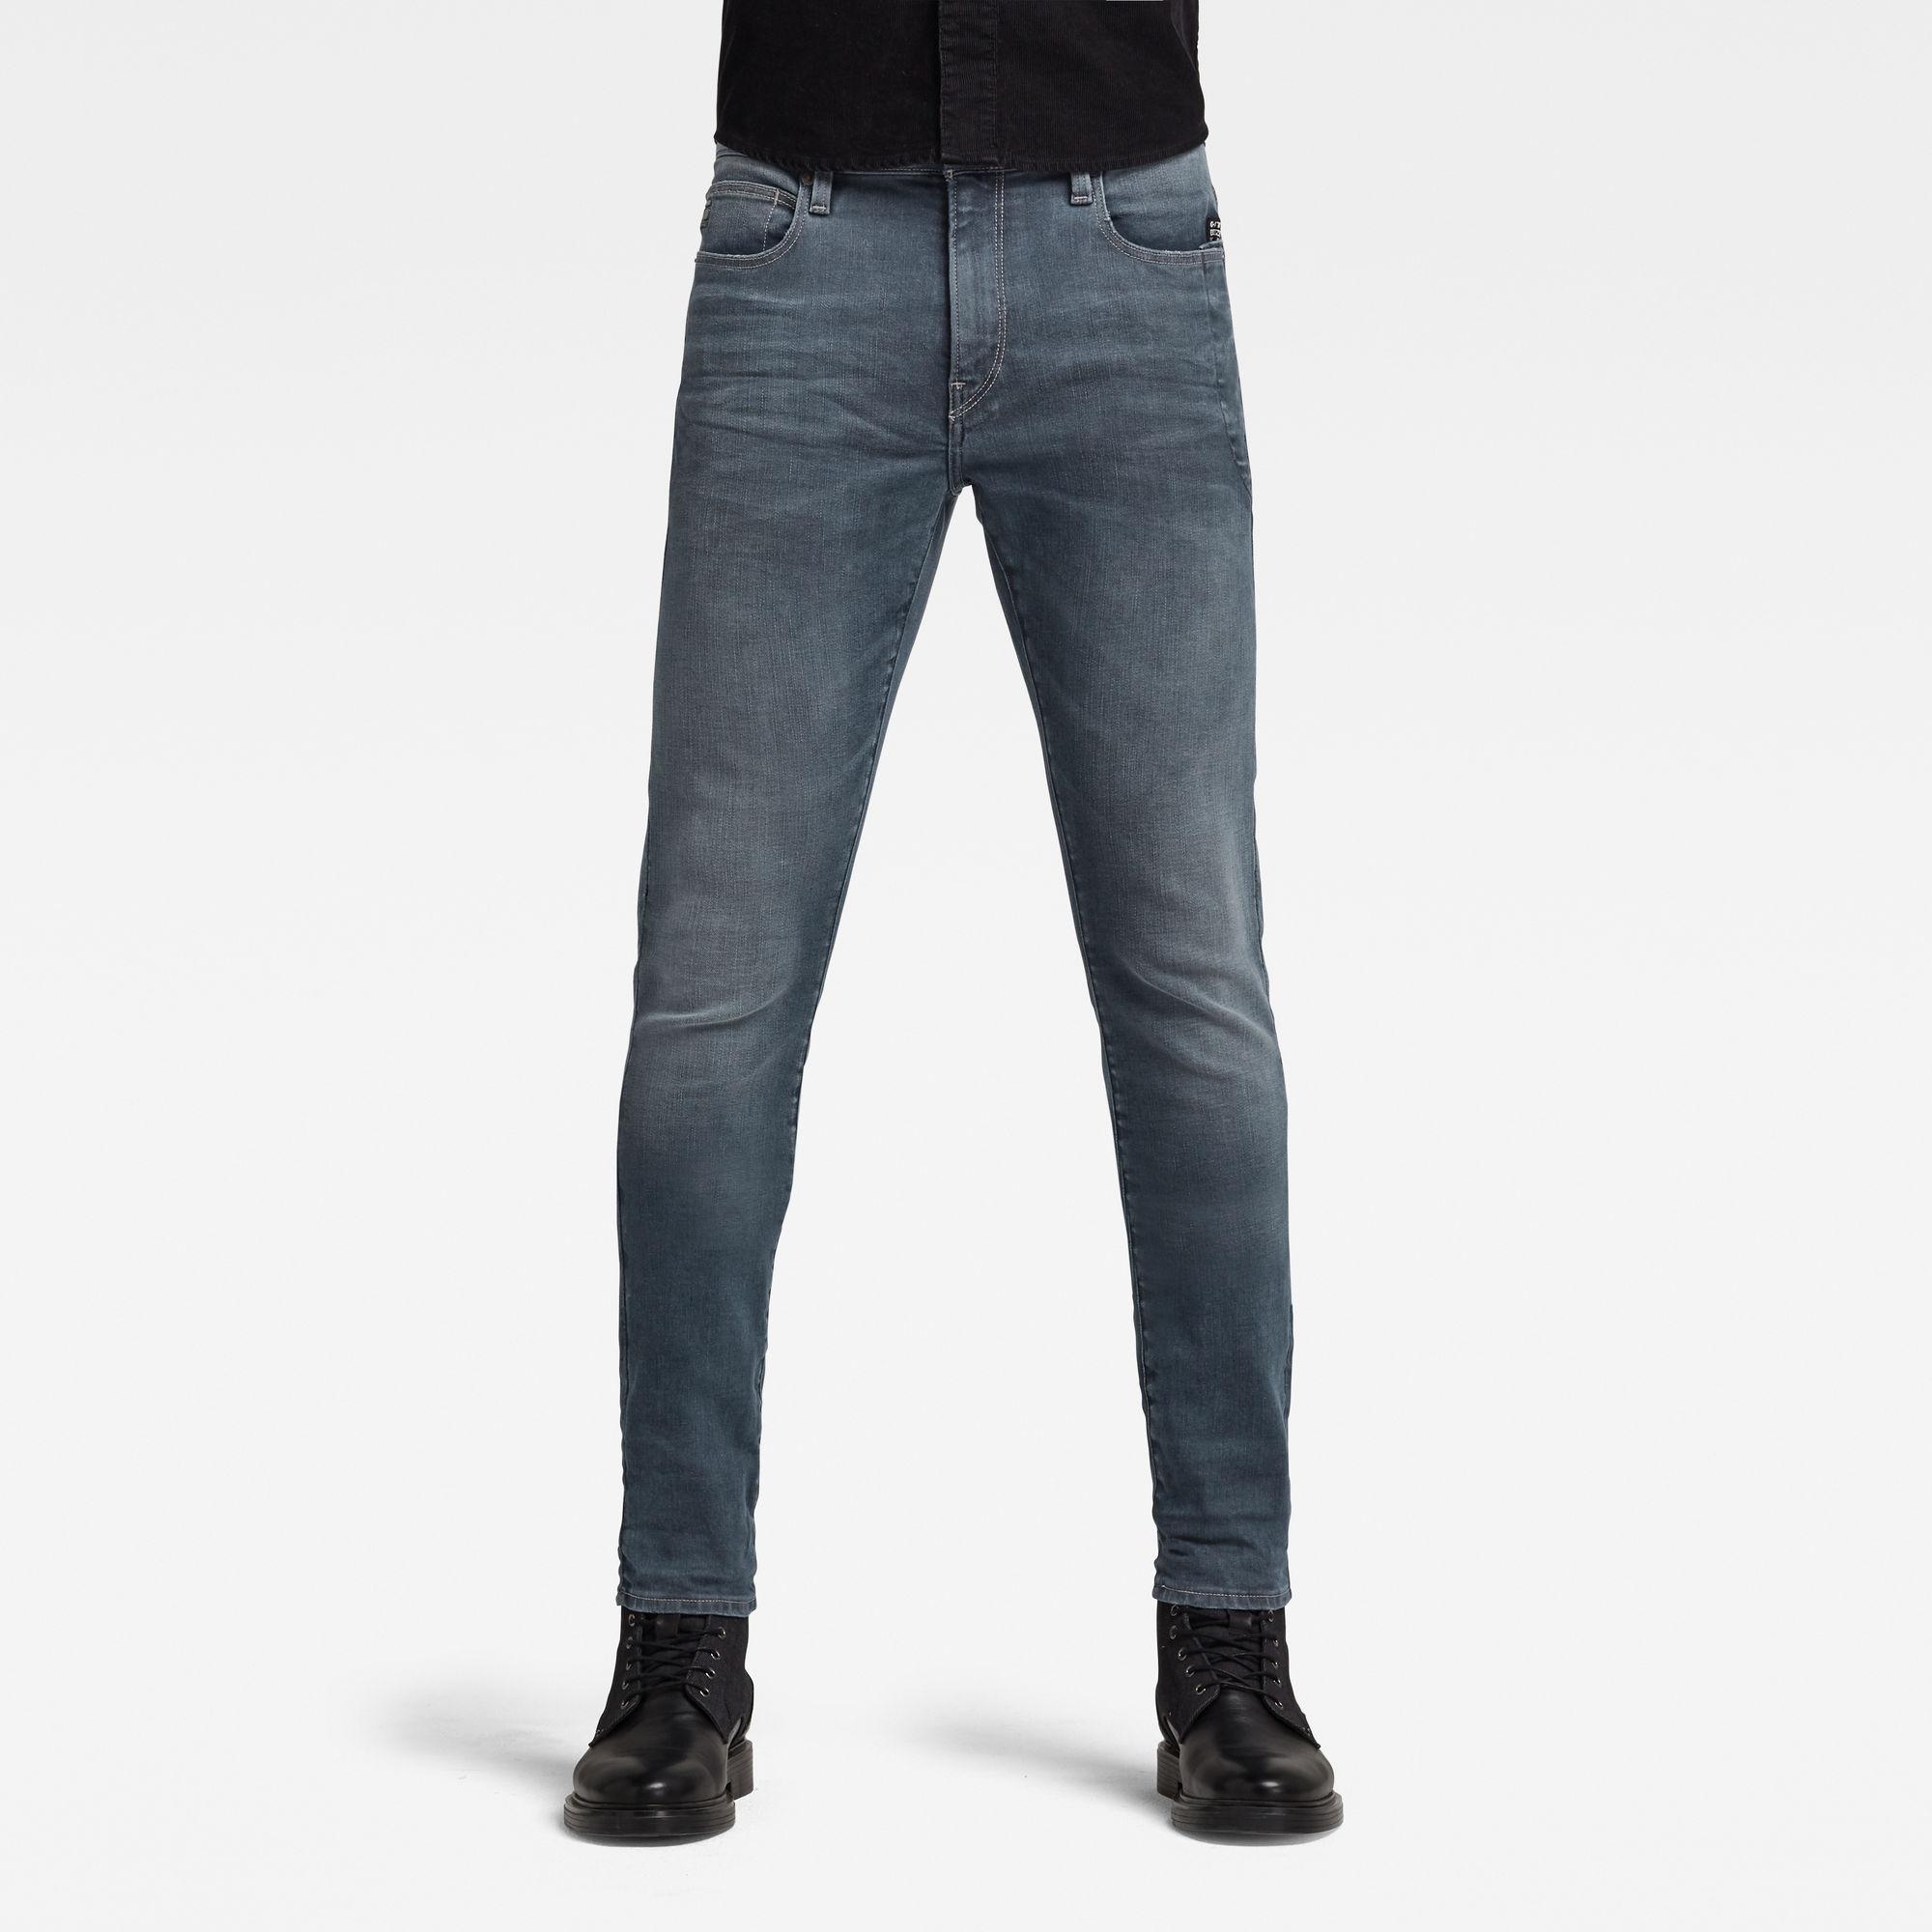 G-Star RAW Heren Lancet Skinny Jeans Donkerblauw